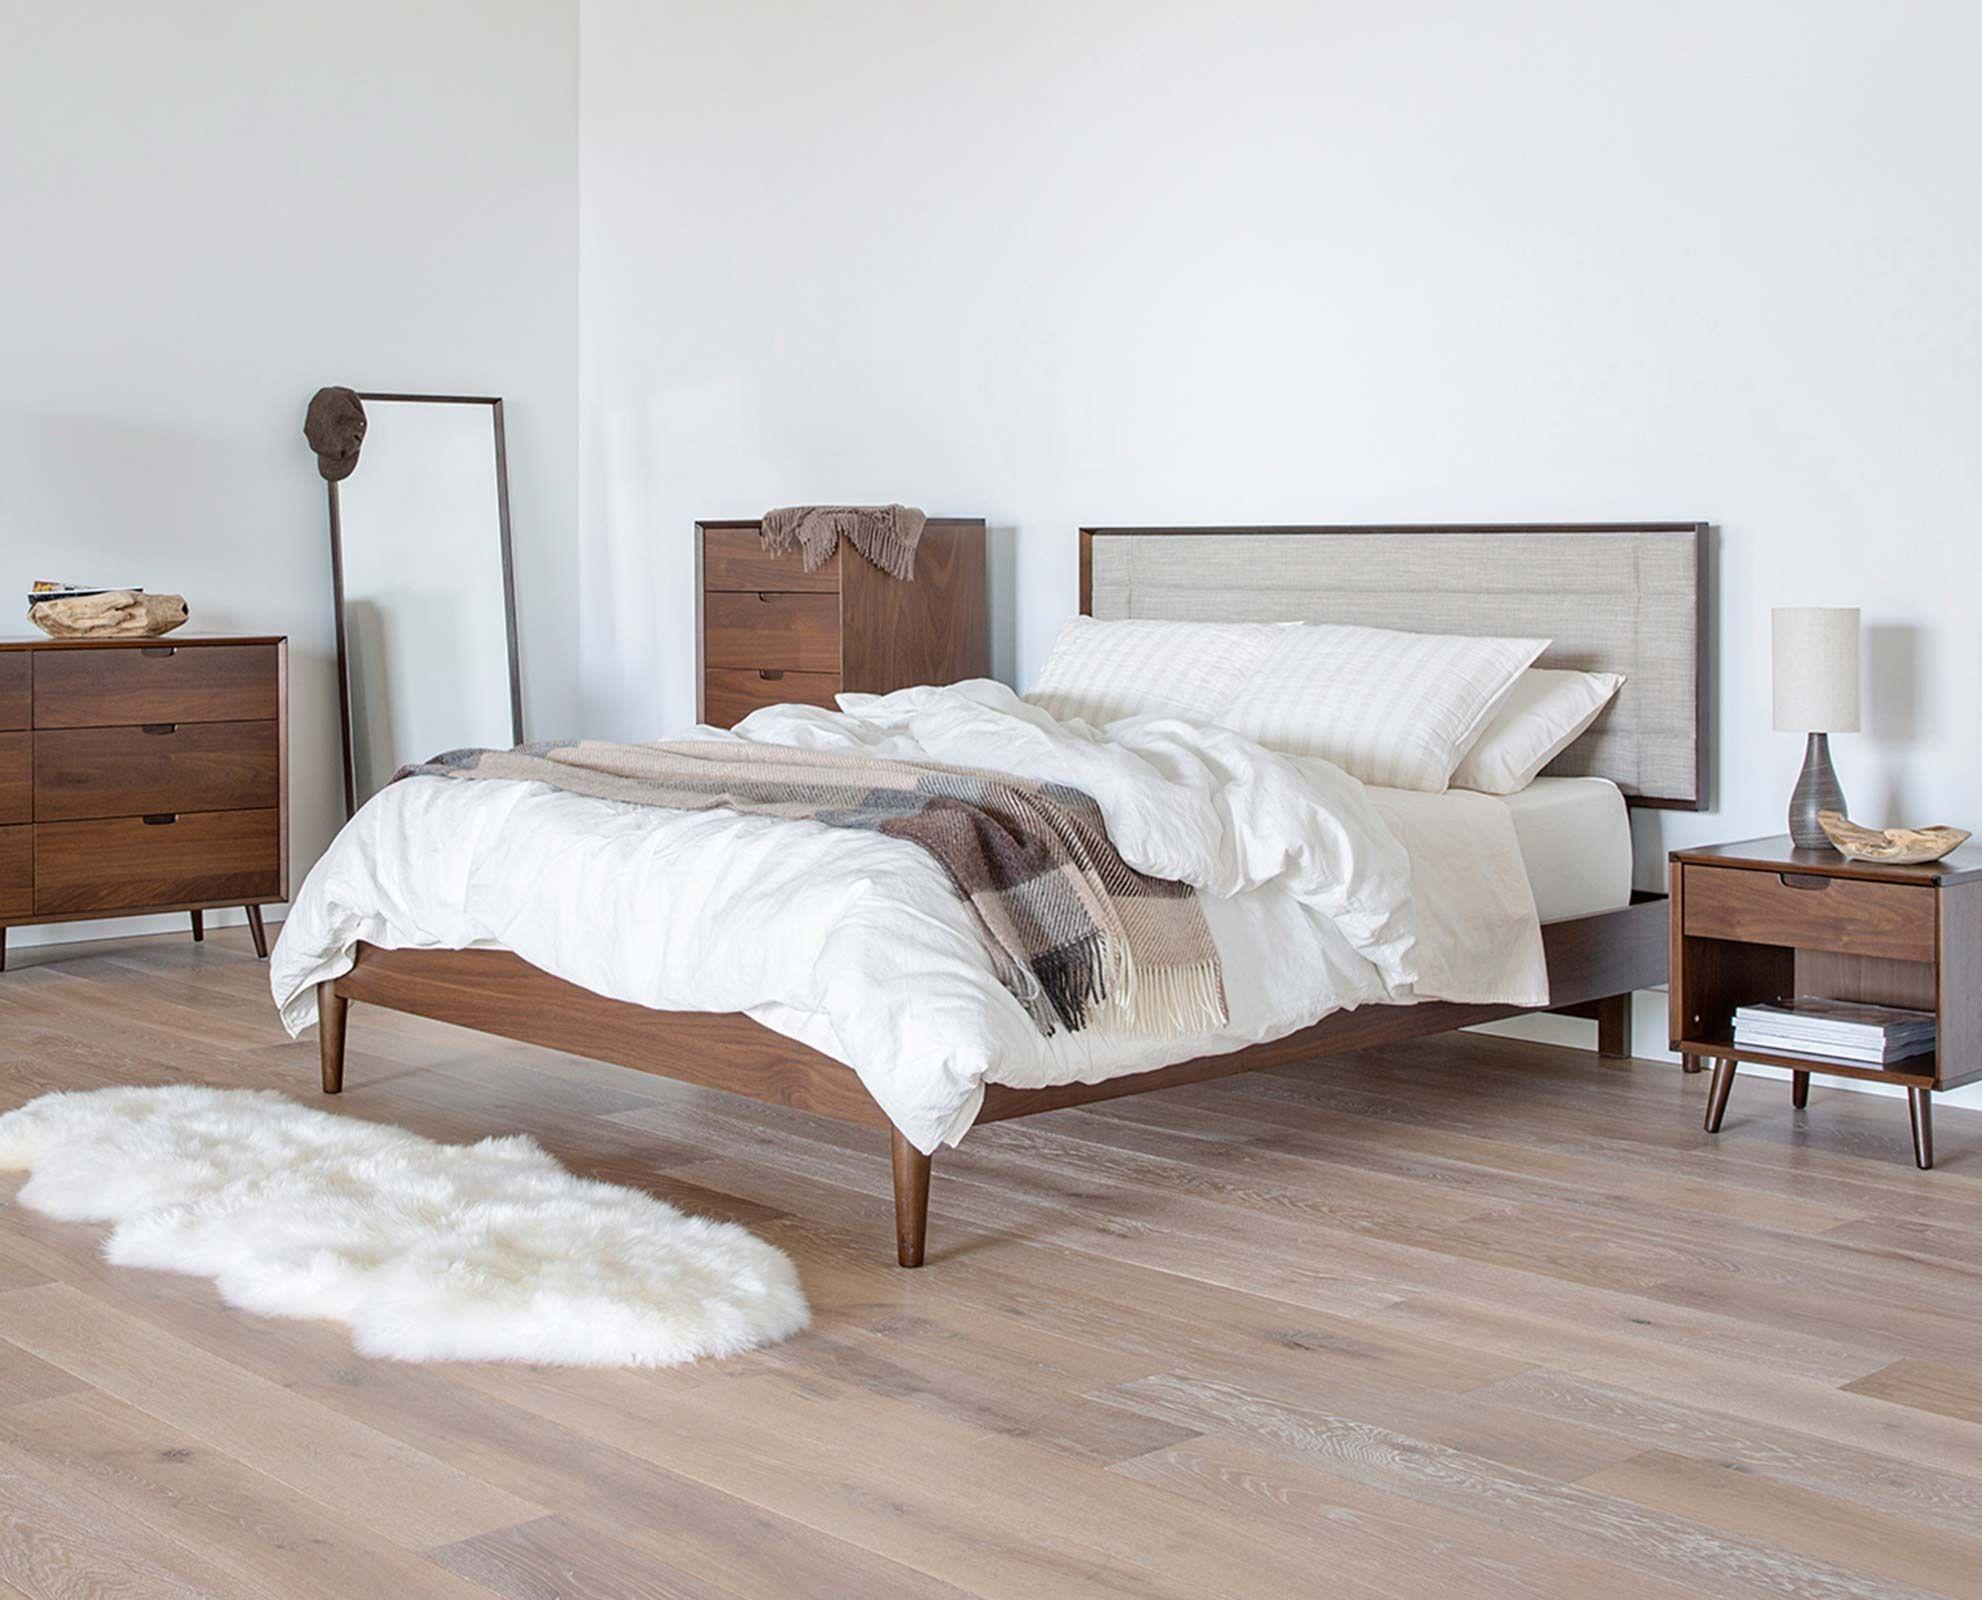 Juneau Bedroom Set from Dania Furniture Co. #